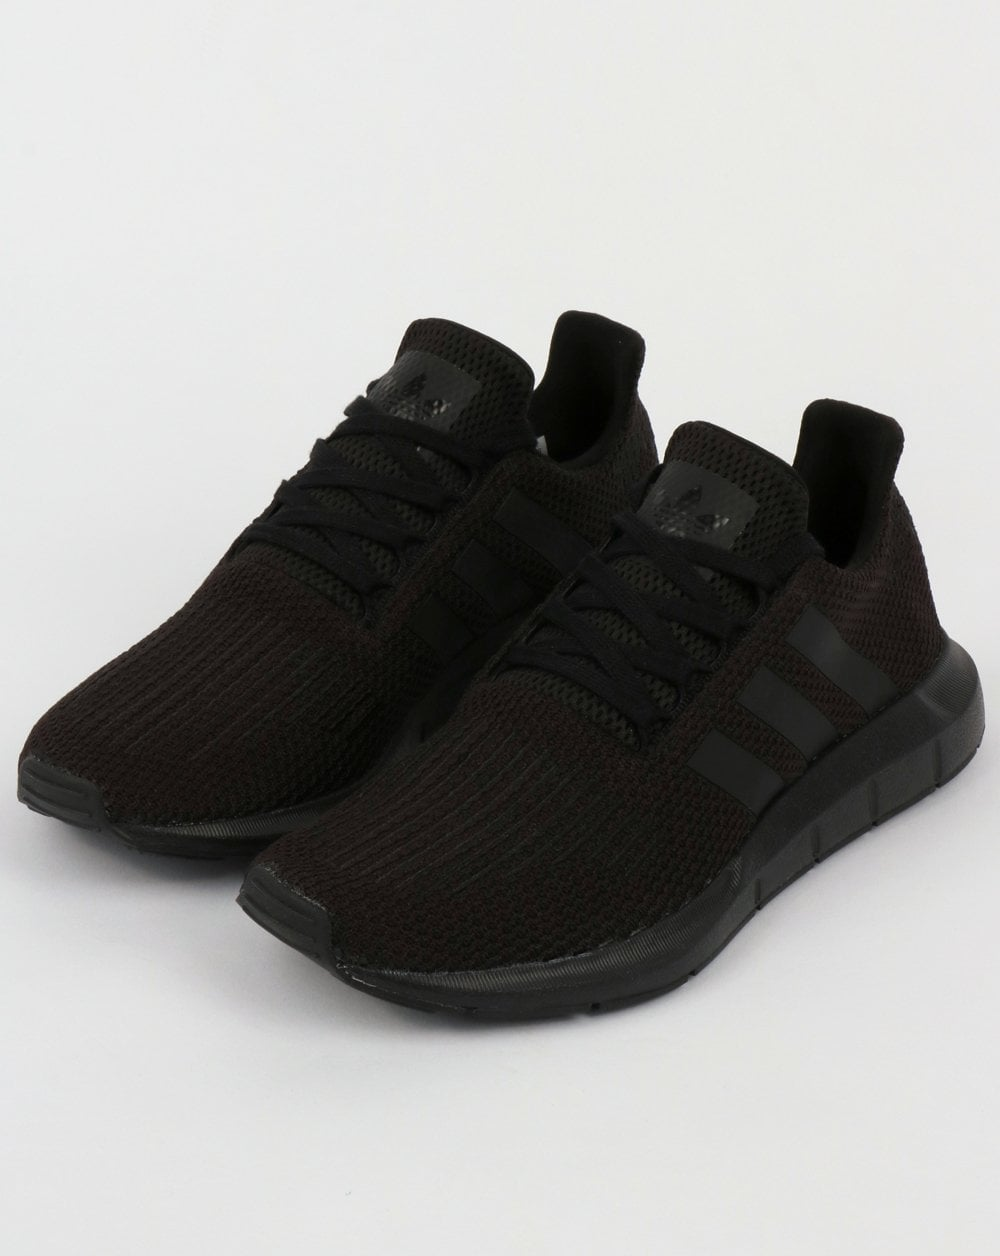 ebc8e5d360 Adidas Swift Run Trainers Triple Black